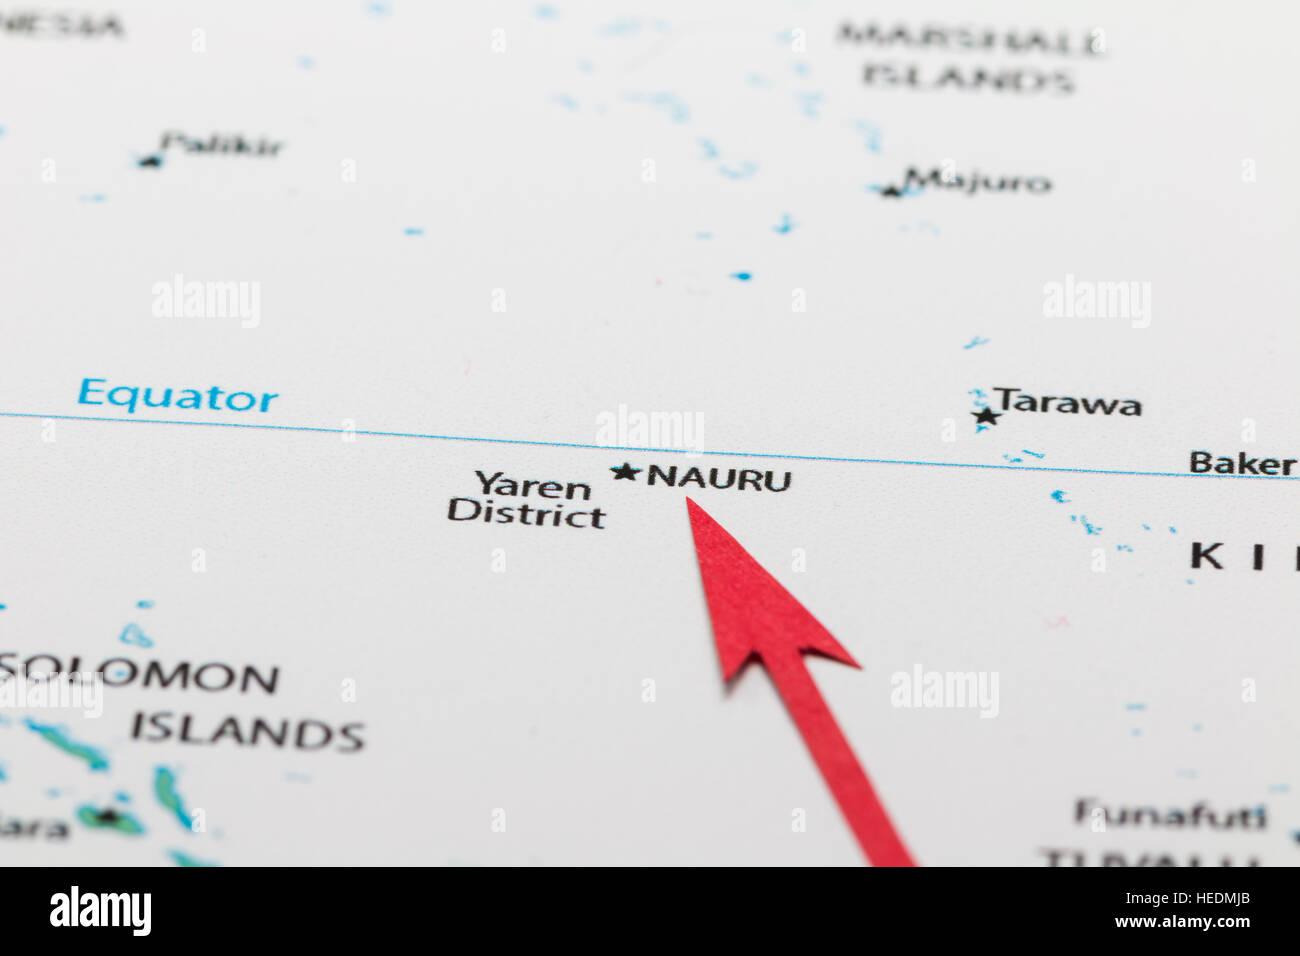 Nauru Stock Photos Nauru Stock Images Alamy